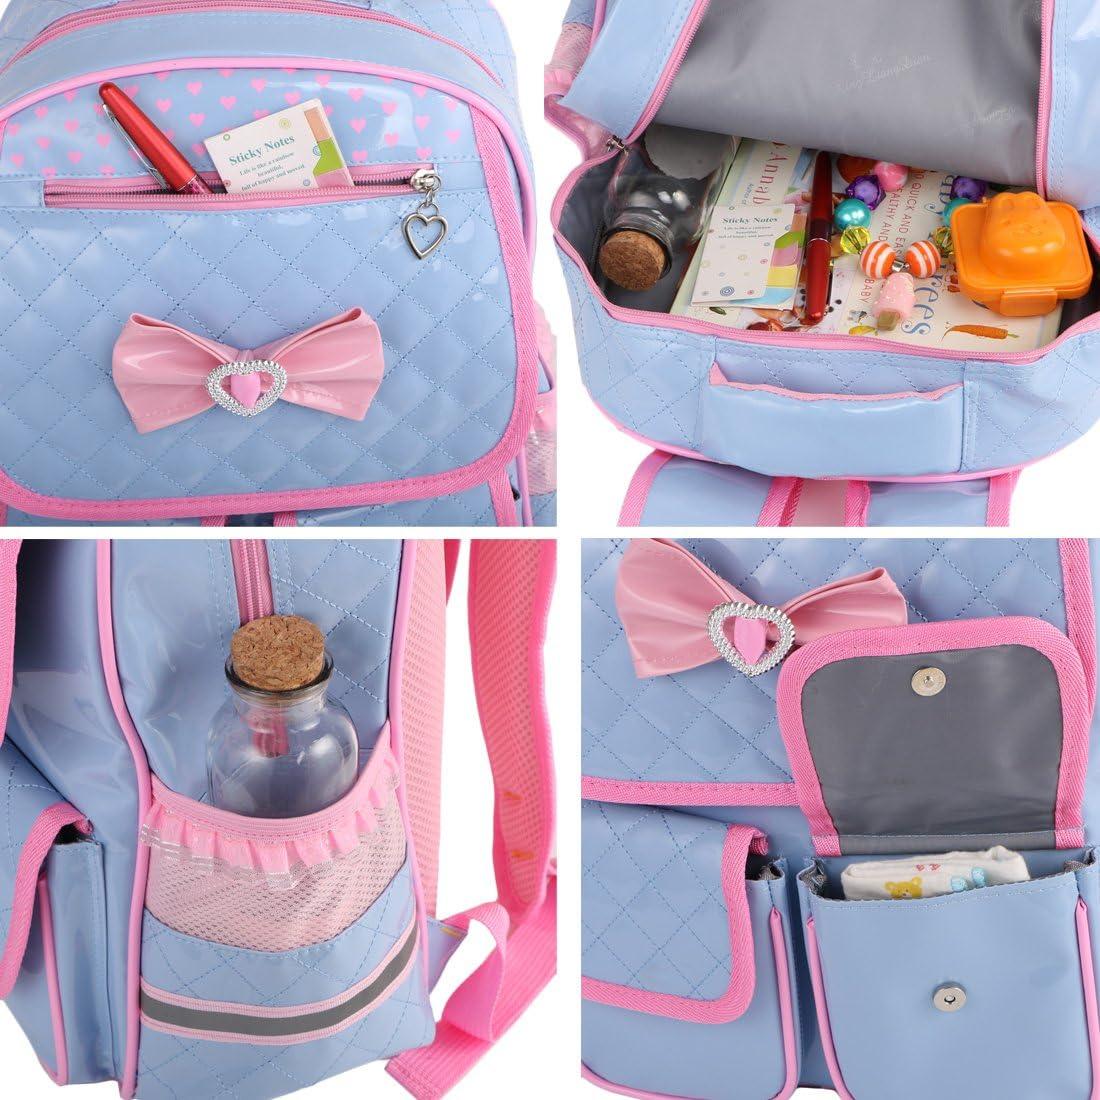 kilofly Girls PU Leather Laptop School Bag Travel Backpack Zippered Pouch Set